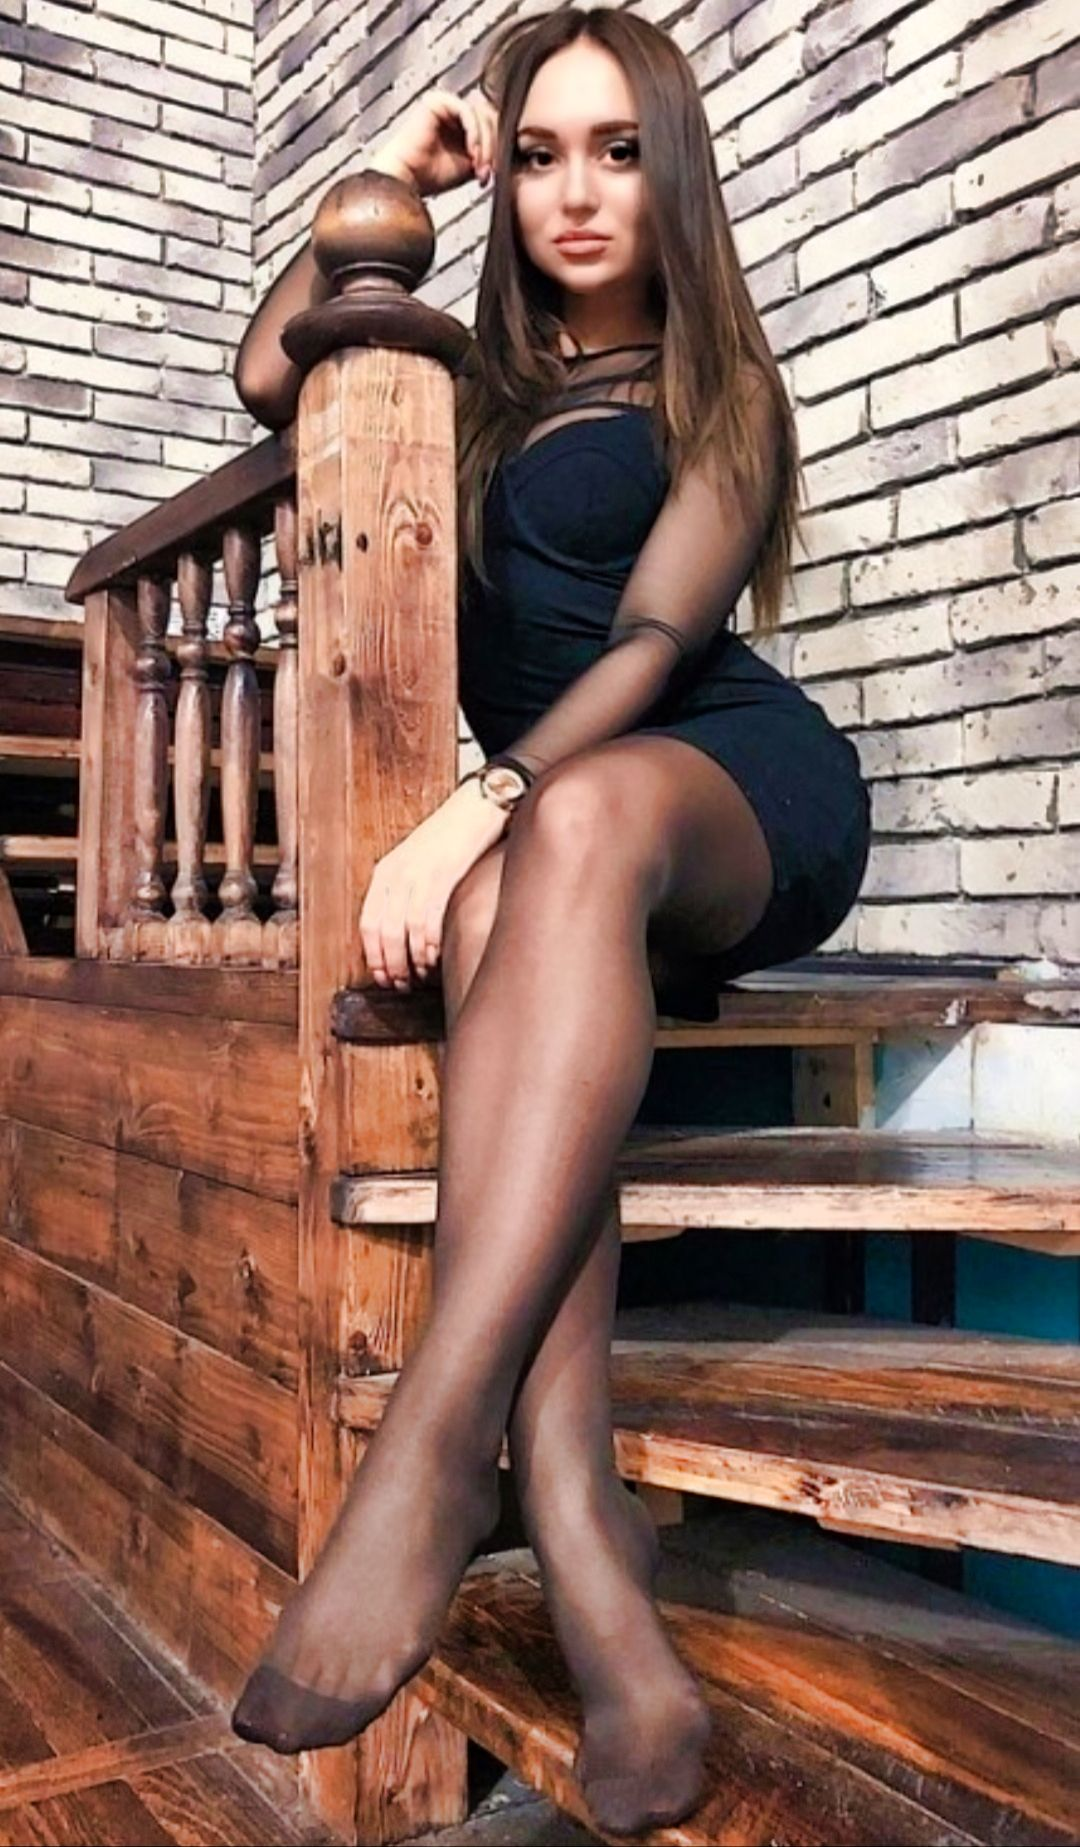 Pin de arch en Stockings legs and heels 15 | Sirvienta